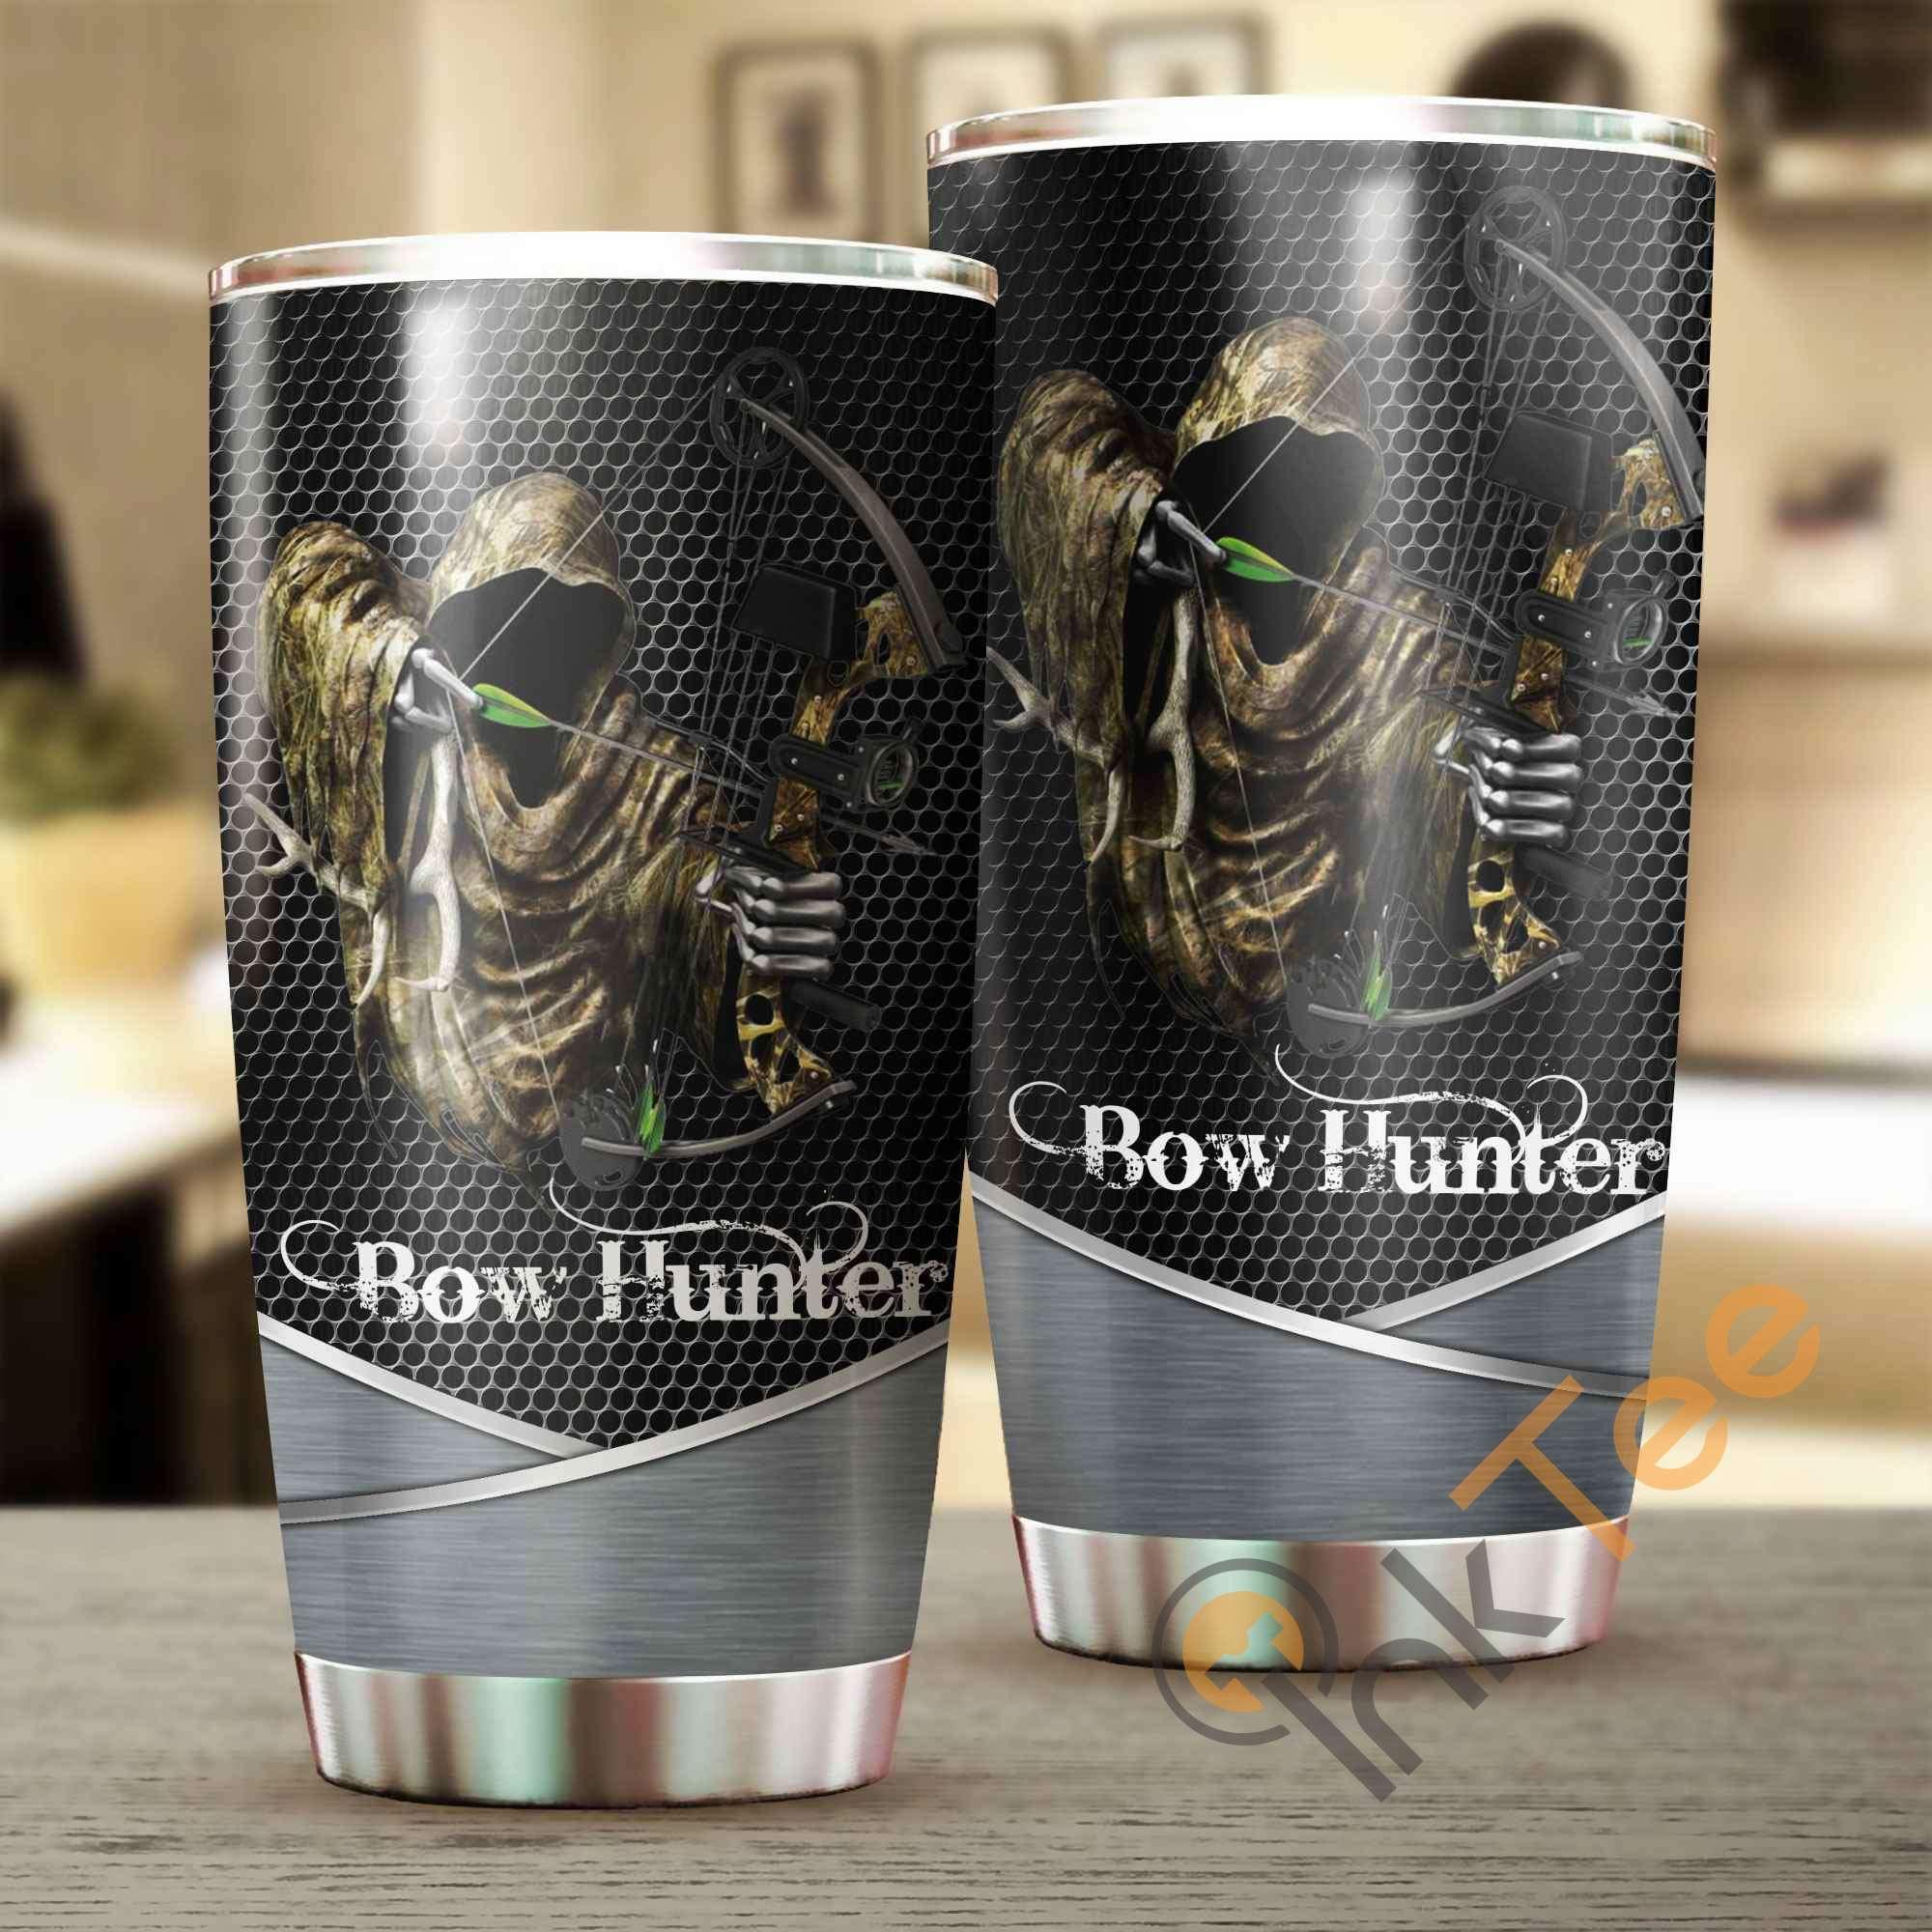 Bow Hunter Metal Amazon Best Seller Sku 3133 Stainless Steel Tumbler